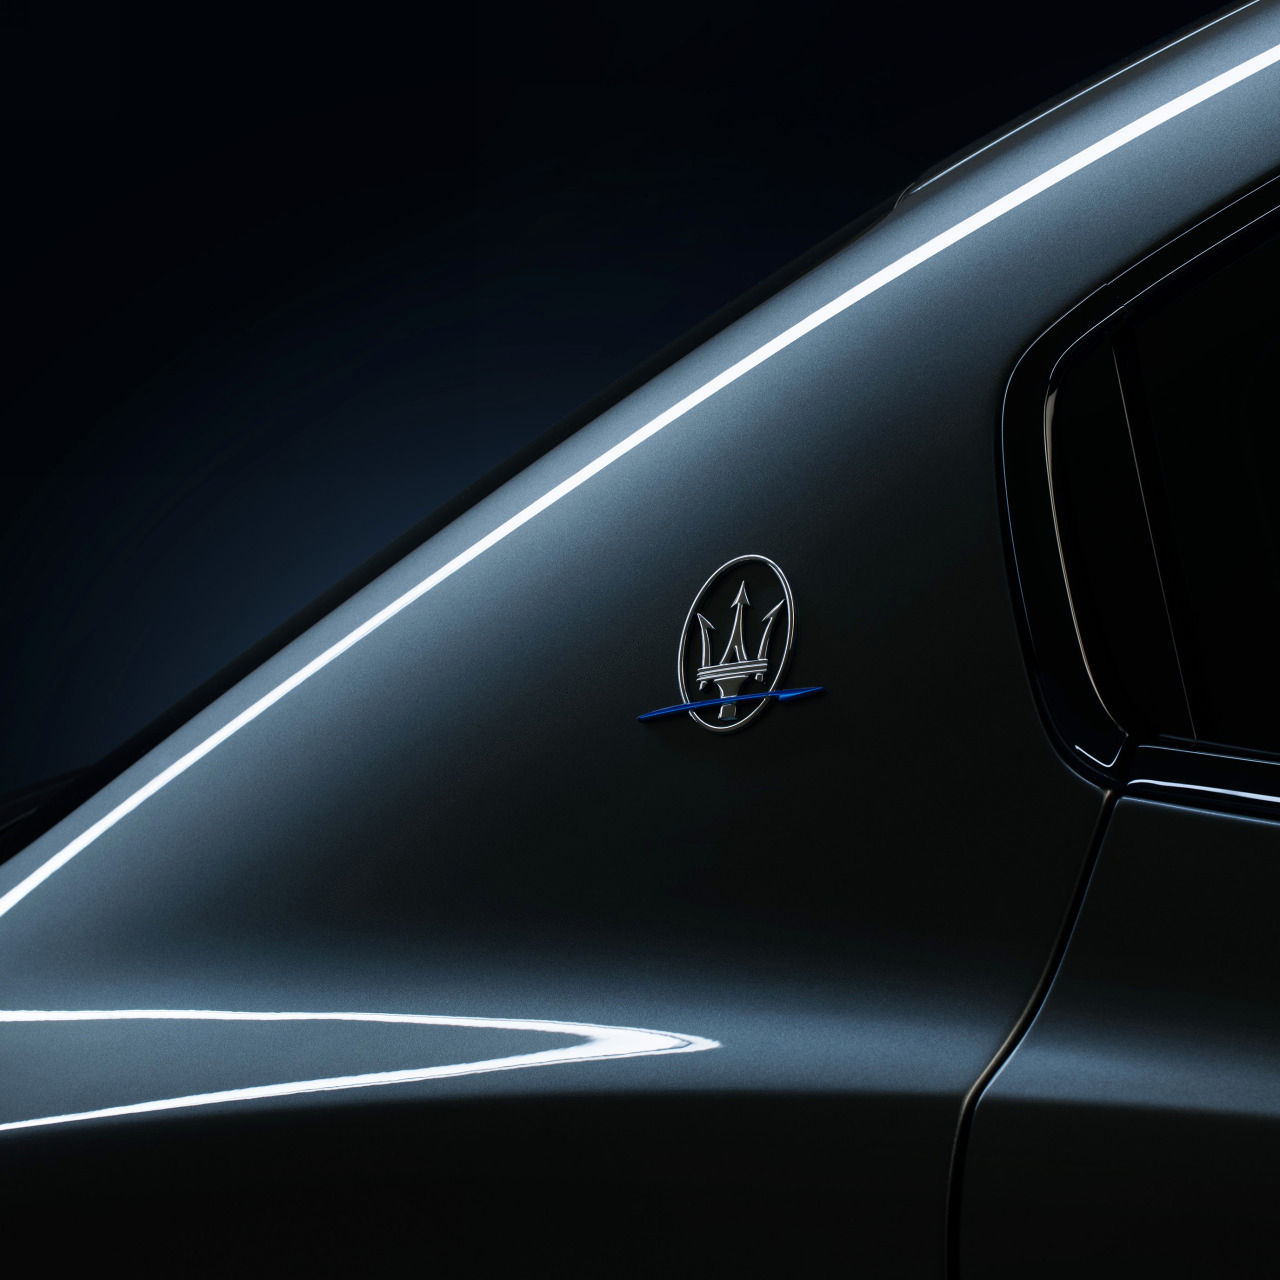 Maserati Ghibli Hybrid - Saetta Logo